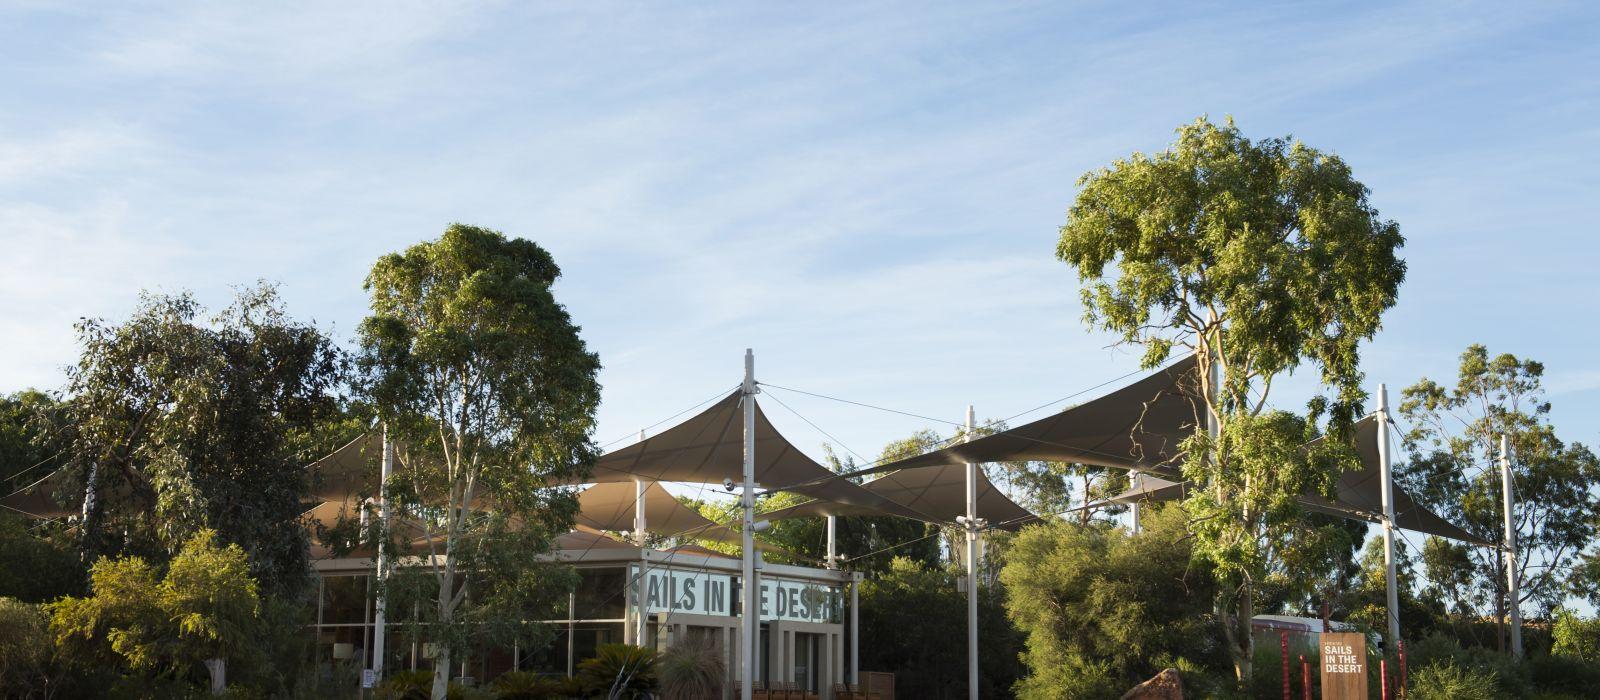 Hotel Voyages Sails in the Desert Australien